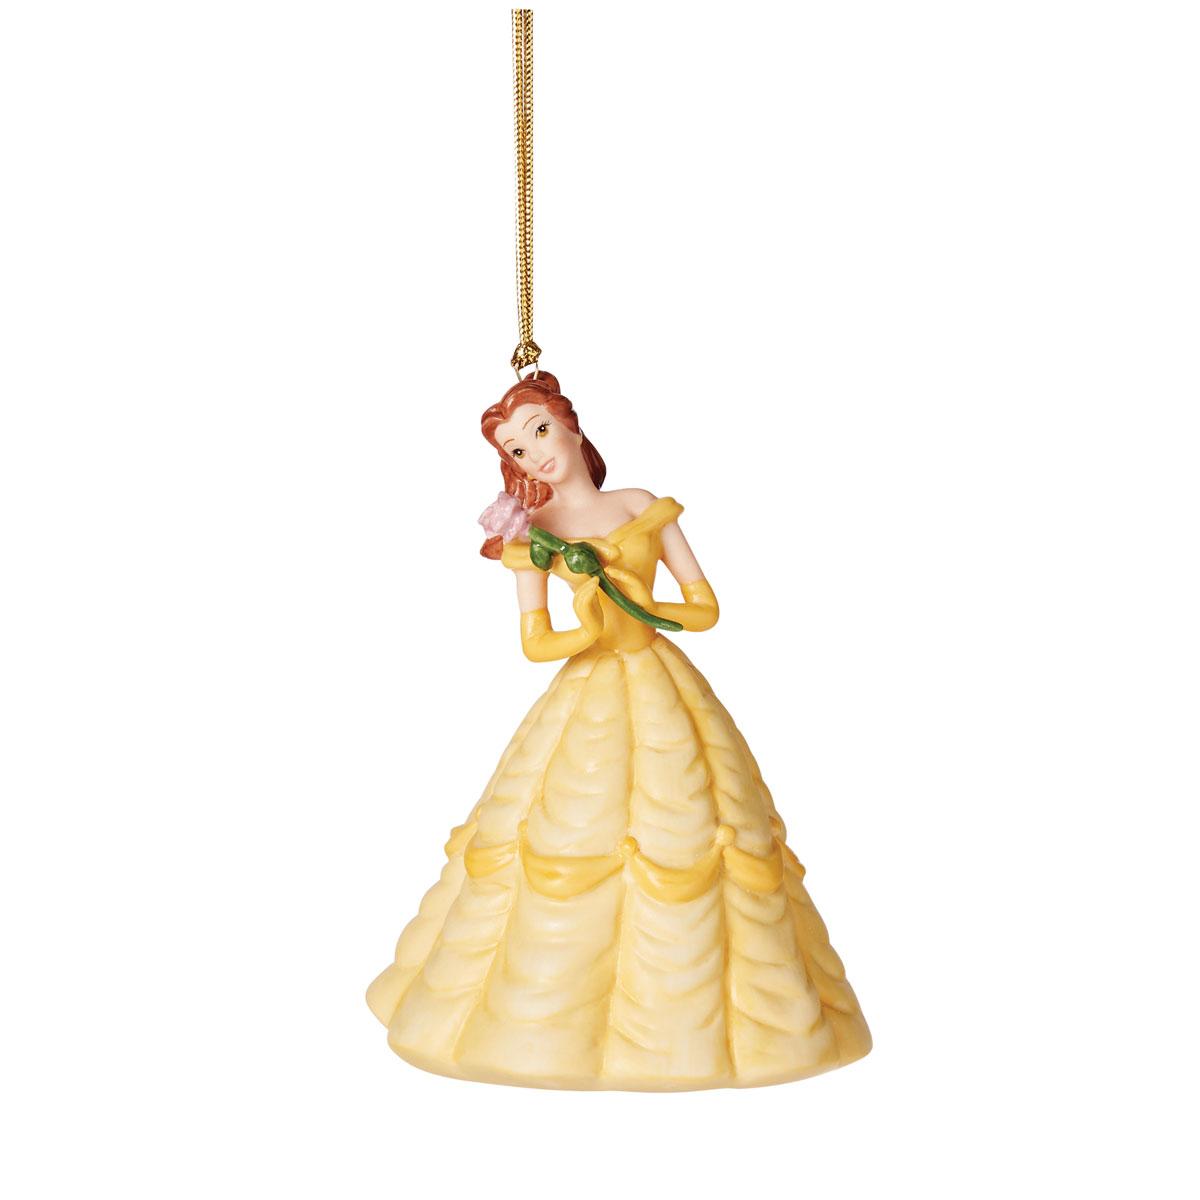 Lenox 2021 Disney Princess Belle 30th Anniversary Ornament